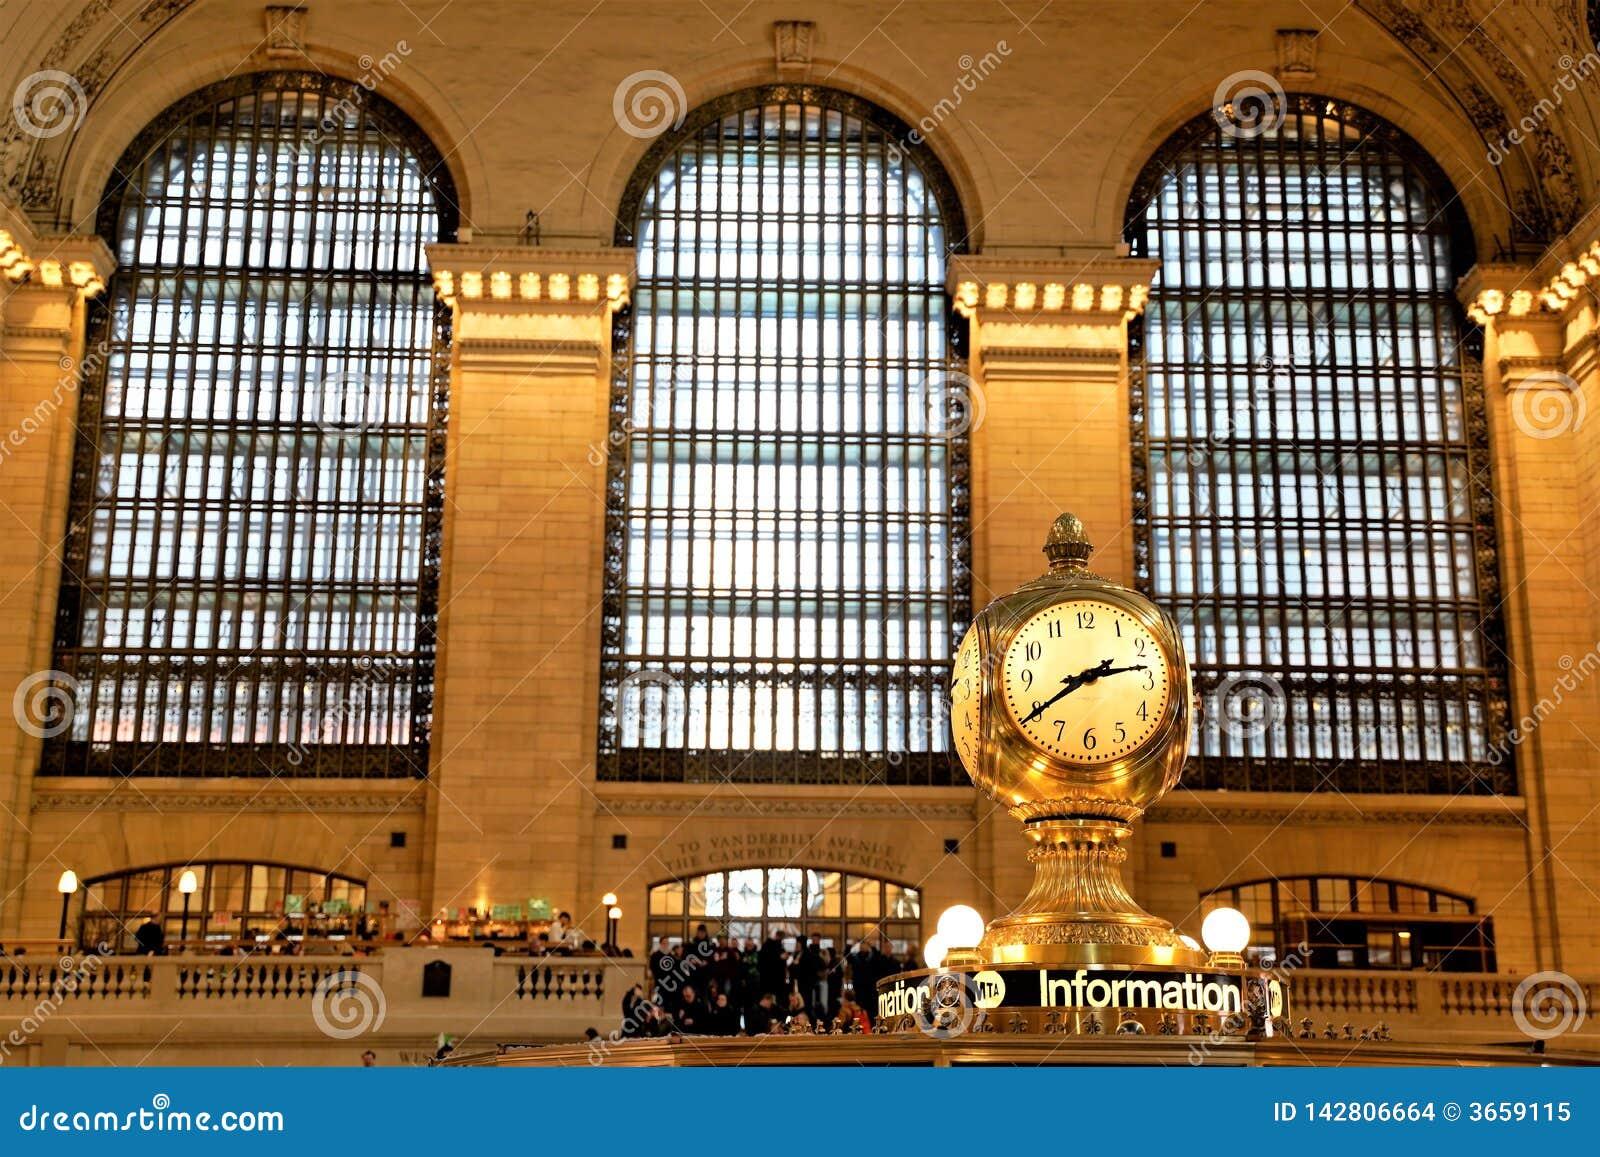 Binnenland van Hoofdsamenkomst van Grand Central -Terminal met Klok en mensen die rondwandelen Mooie vensters erachter close-up